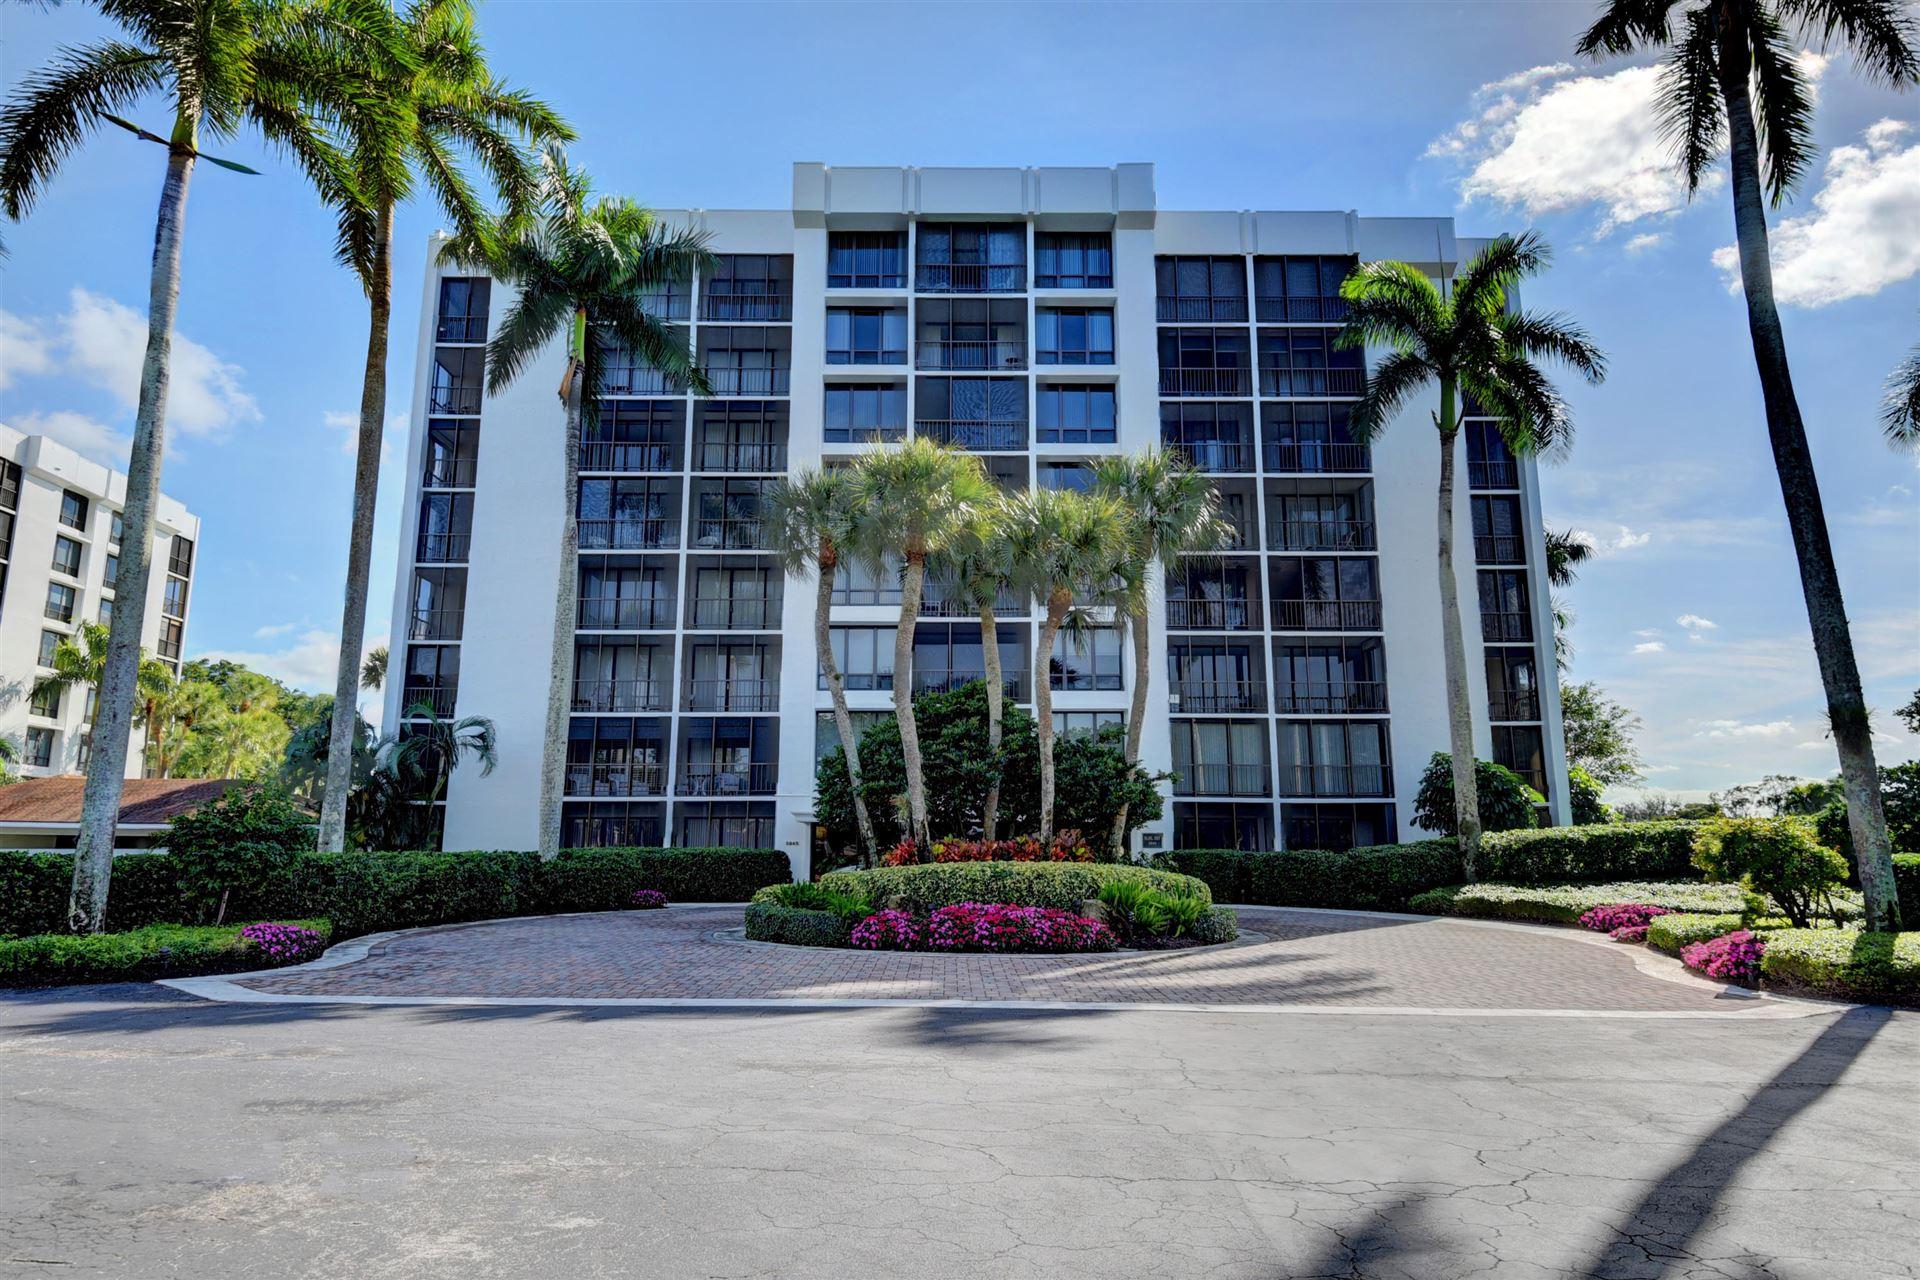 6845 Willow Wood Drive #3065, Boca Raton, FL 33434 - #: RX-10629919